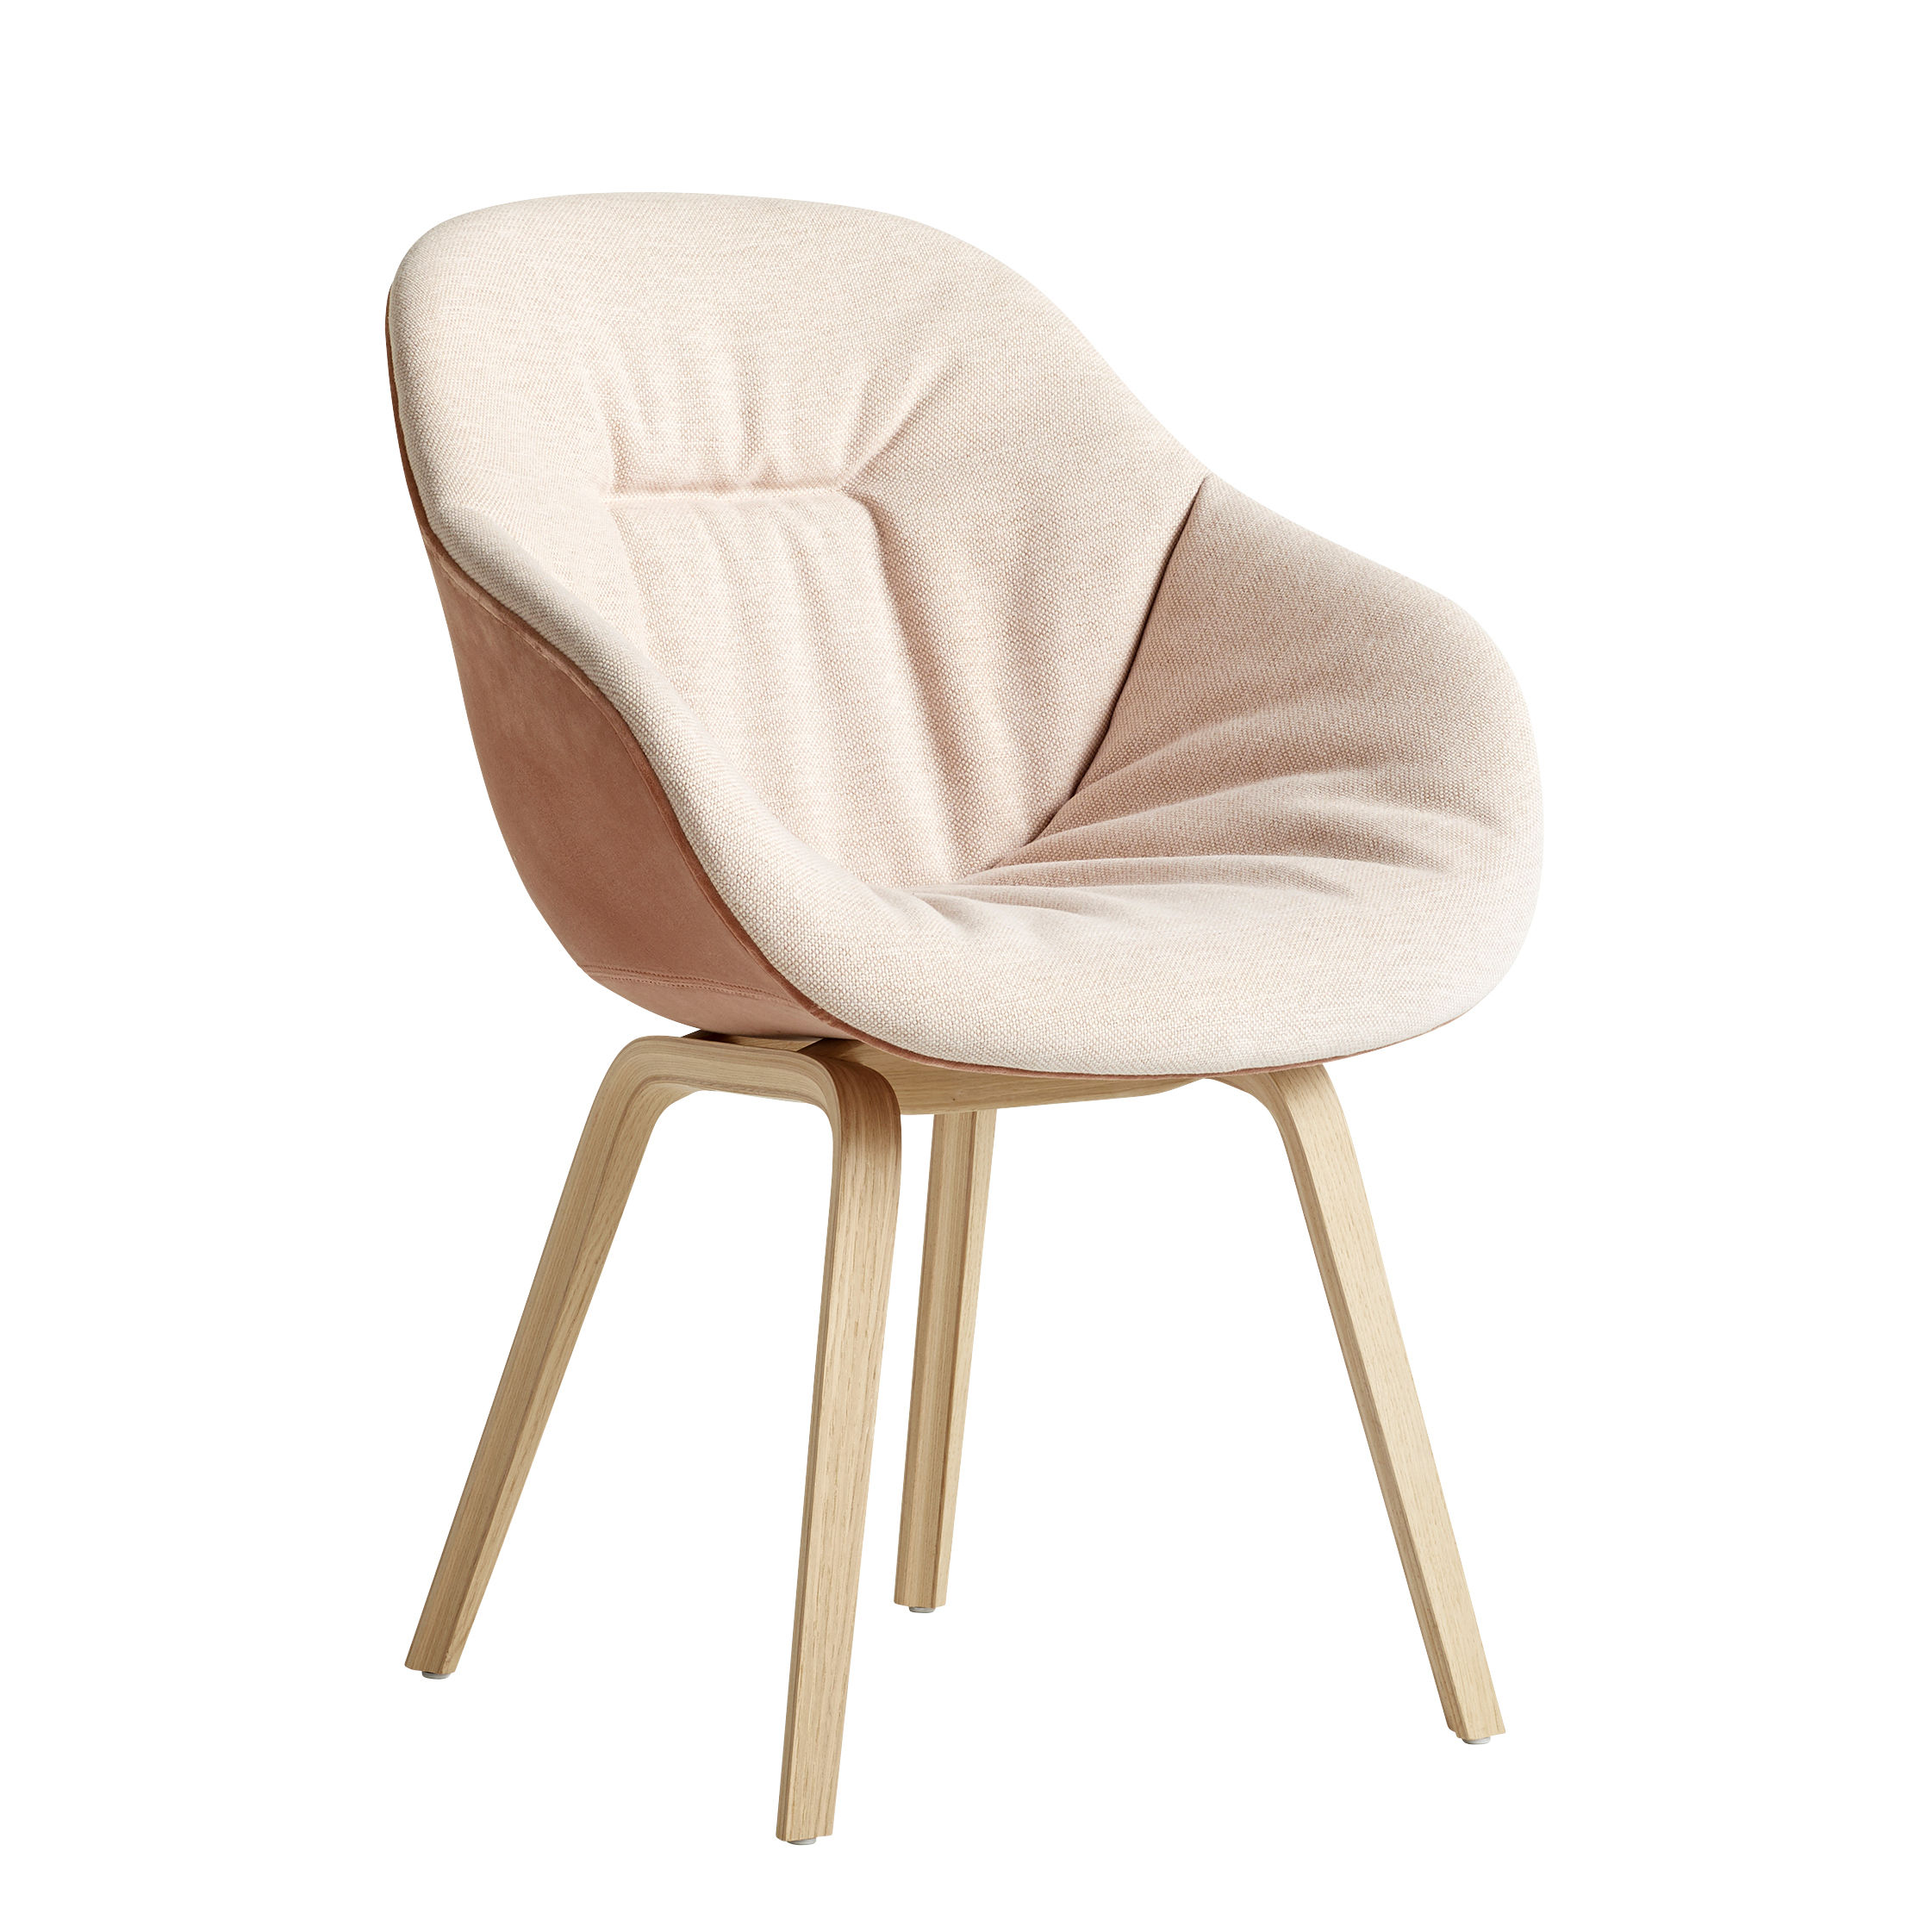 Möbel - Stühle  - About a chair AAC123 Soft Duo Gepolsterter Sessel / Hohe Rückenlehne - Ganz mit Steppstoff bezogen & matt lackierte Eiche - Hay - Hellrosa & dunkelrosa / Eiche matt lackiert -  Ouate, Eiche, mattlackiert, Gewebe, Polyurethan-Schaum, verstärktes Polypropylen